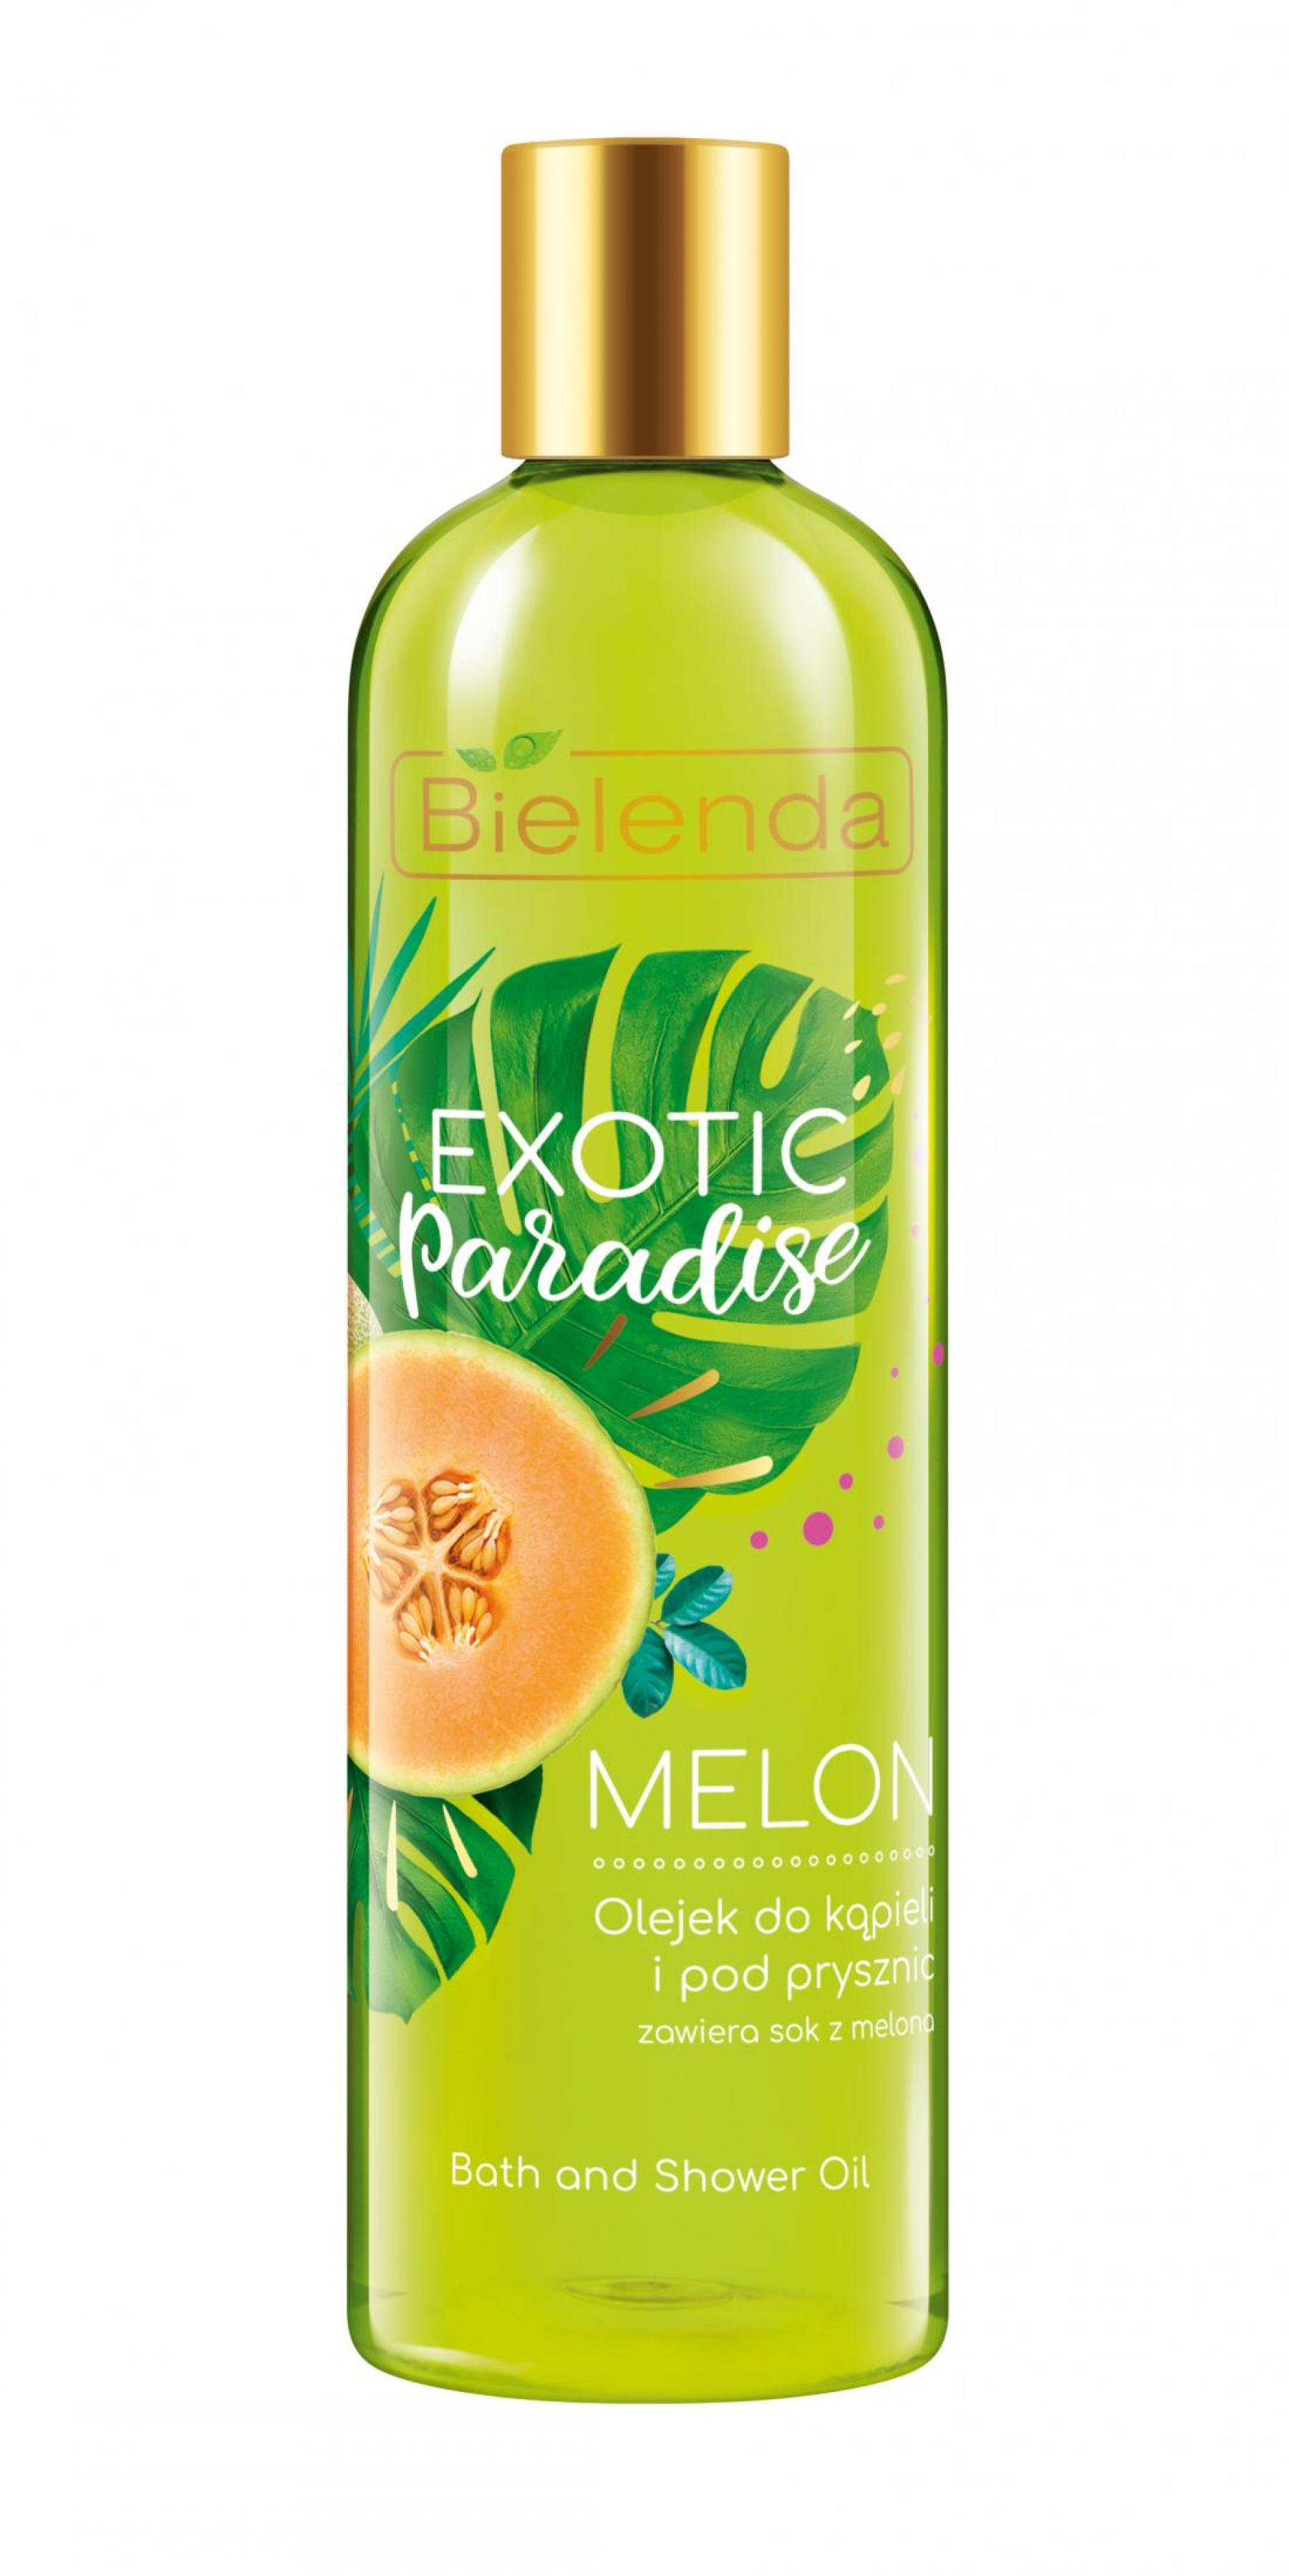 Exotic Paradise Melon 400ml